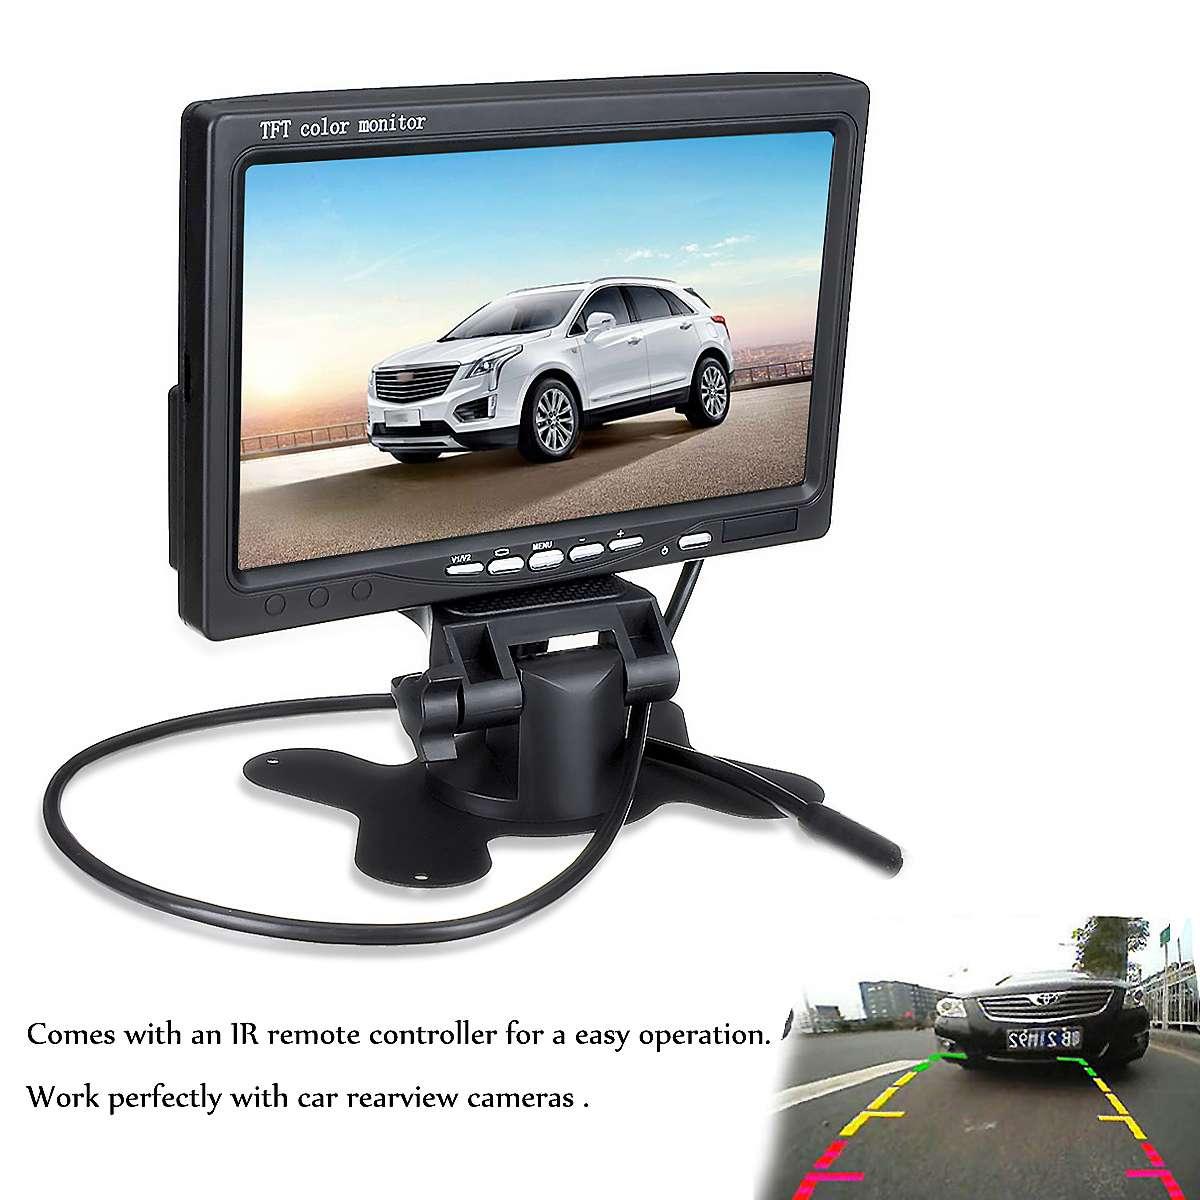 7 pulgadas 12 V TFT LCD de pantalla de Monitor de coche retrovisor pantalla para CCTV invertir de visión trasera cámara de copia de seguridad + control remoto control